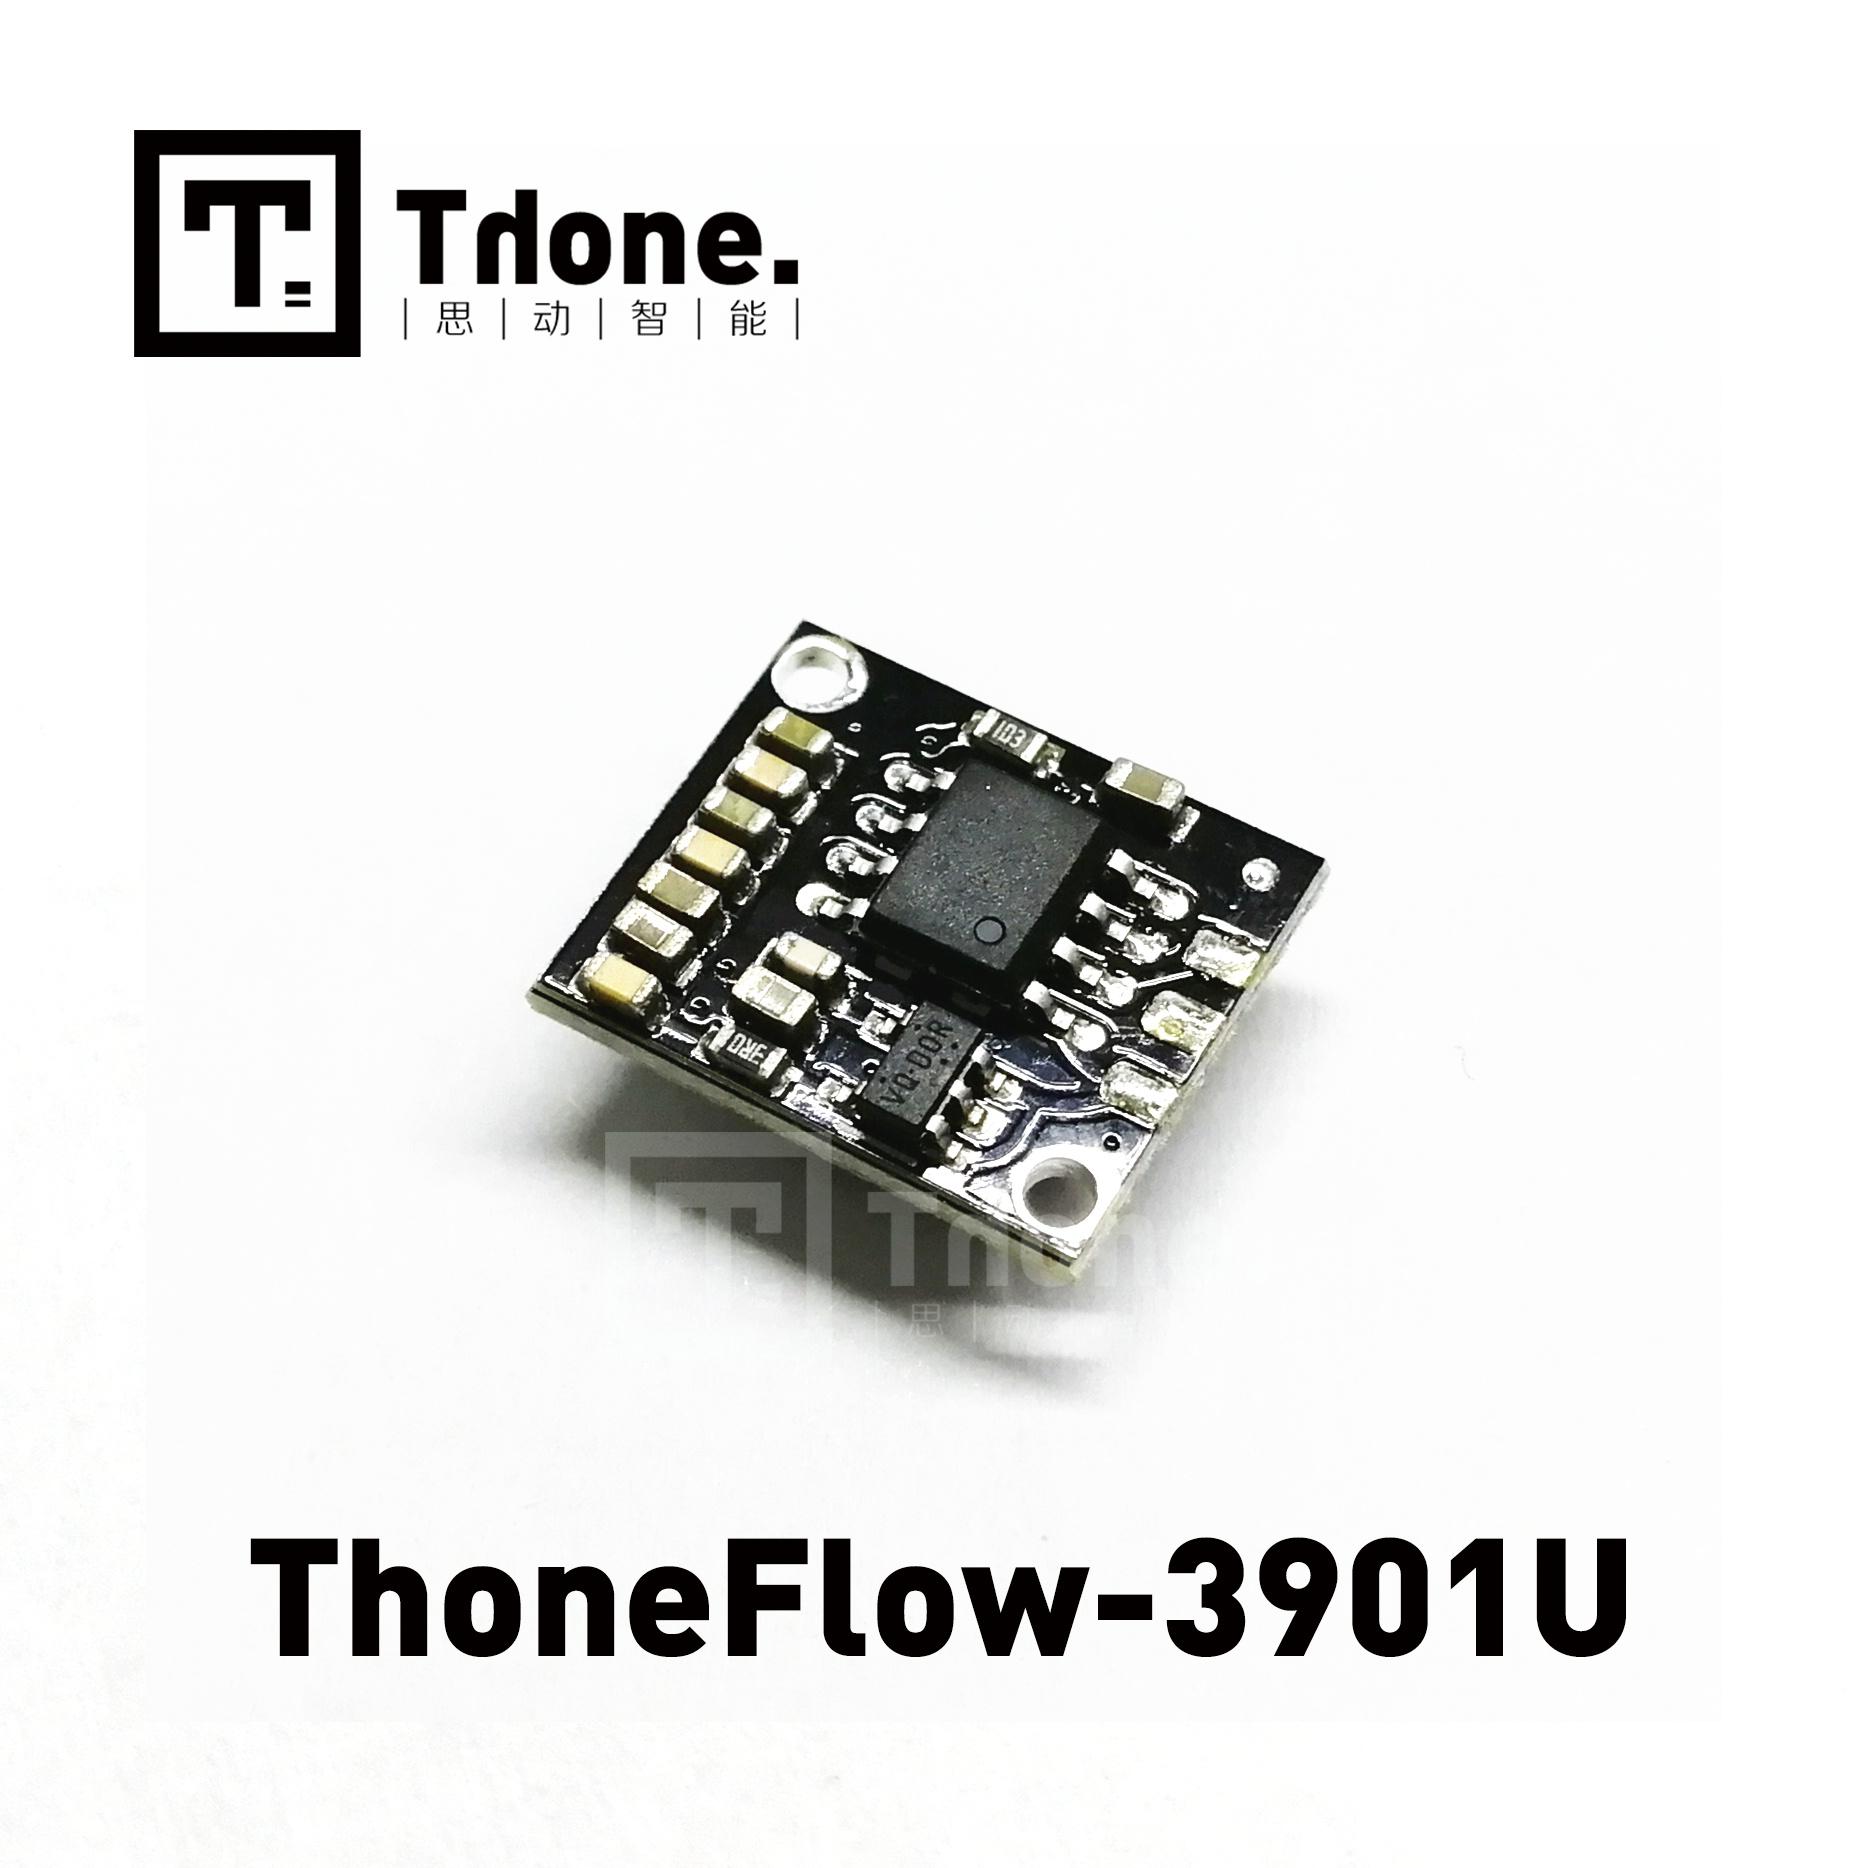 ThoneFlow-3901U UART Version PMW3901 Optical Flow Module - Spotlight